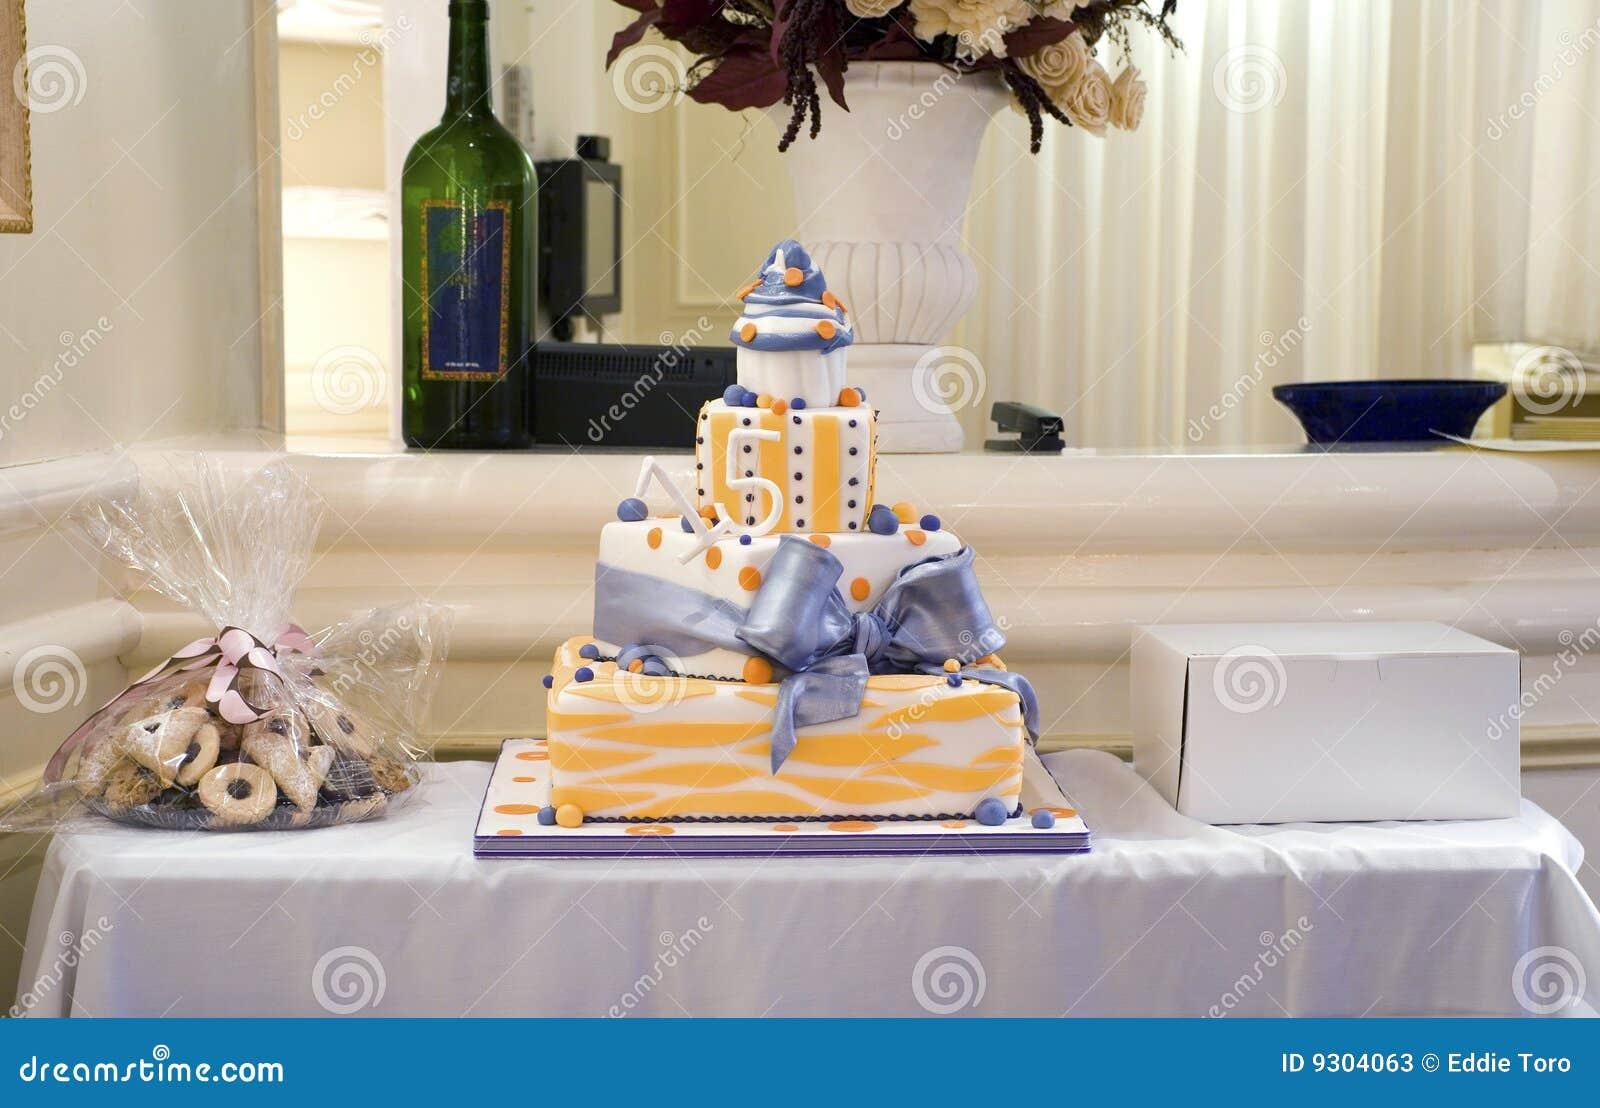 Birthday Cake Clipart - Free Stock Photo by chakomajaw on Stockvault.net